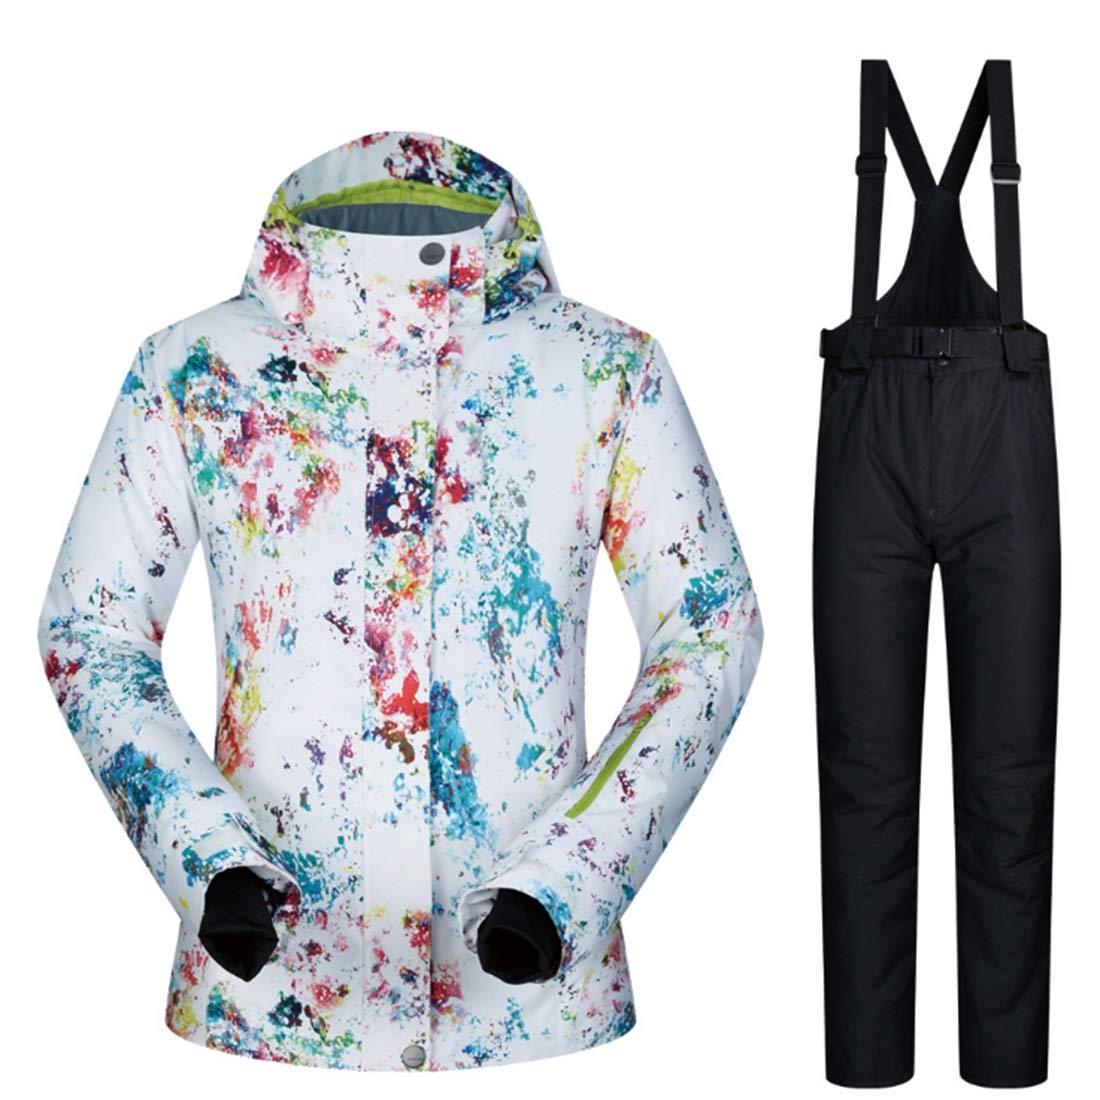 3 XIAMEND Rain Snow Outdoor Hiking Women's Mountain Waterproof Ski Jacket (color   05, Size   S)